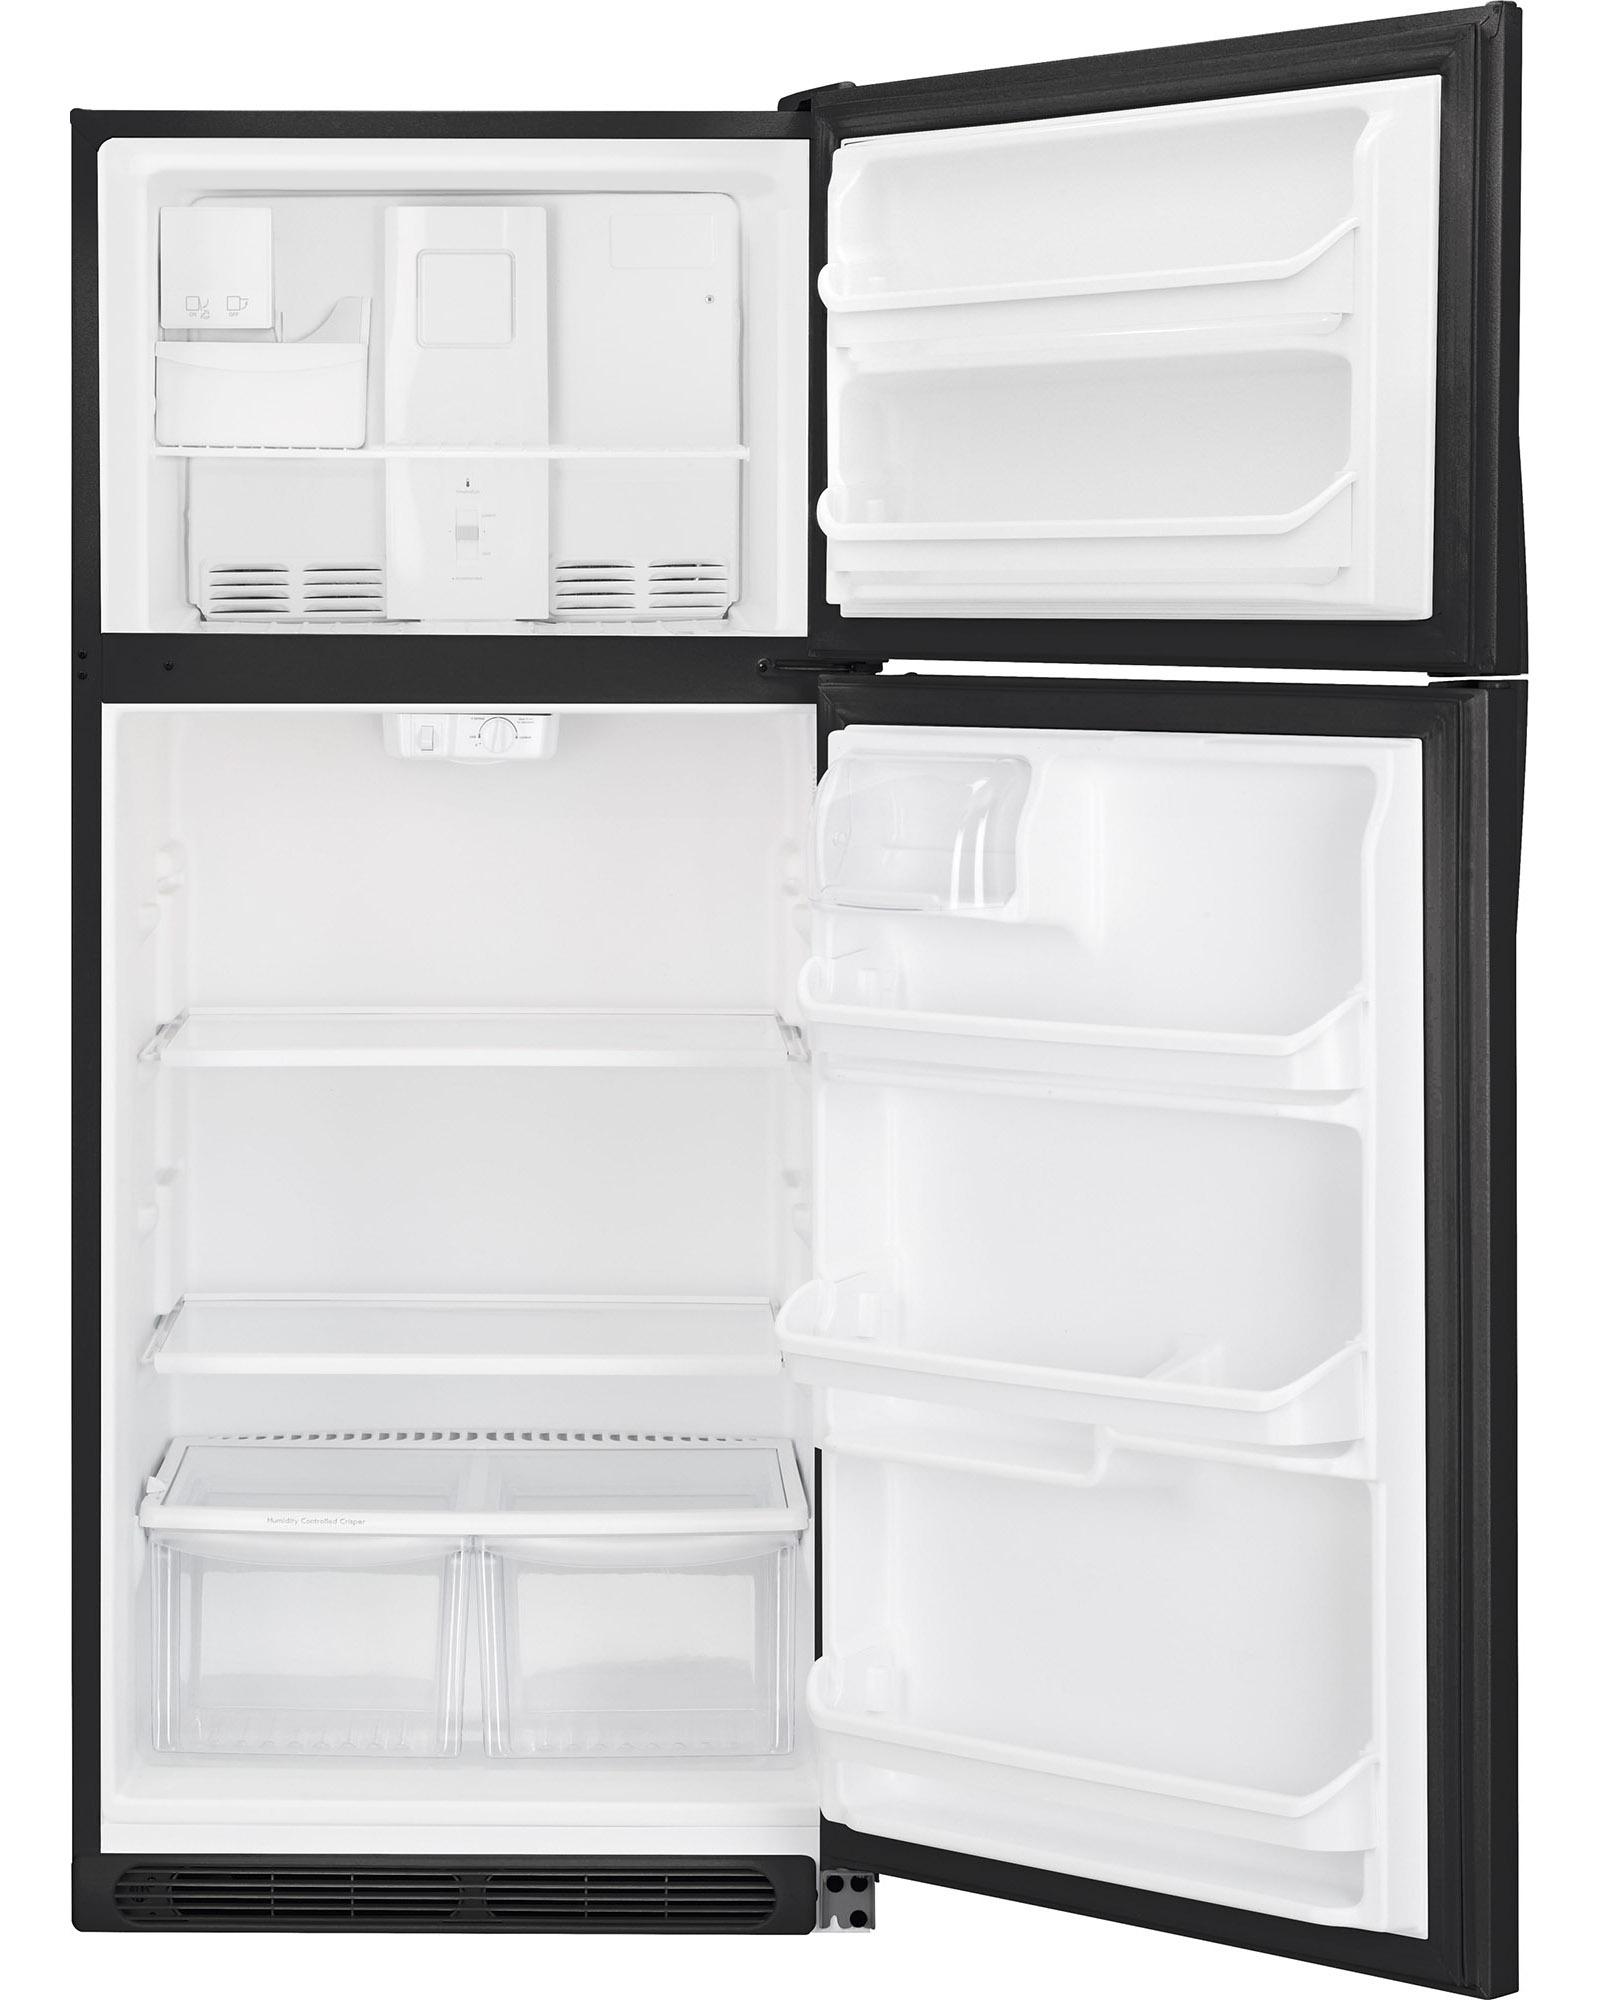 Kenmore 20.4 cu. ft. Top Freezer Refrigerator - Black